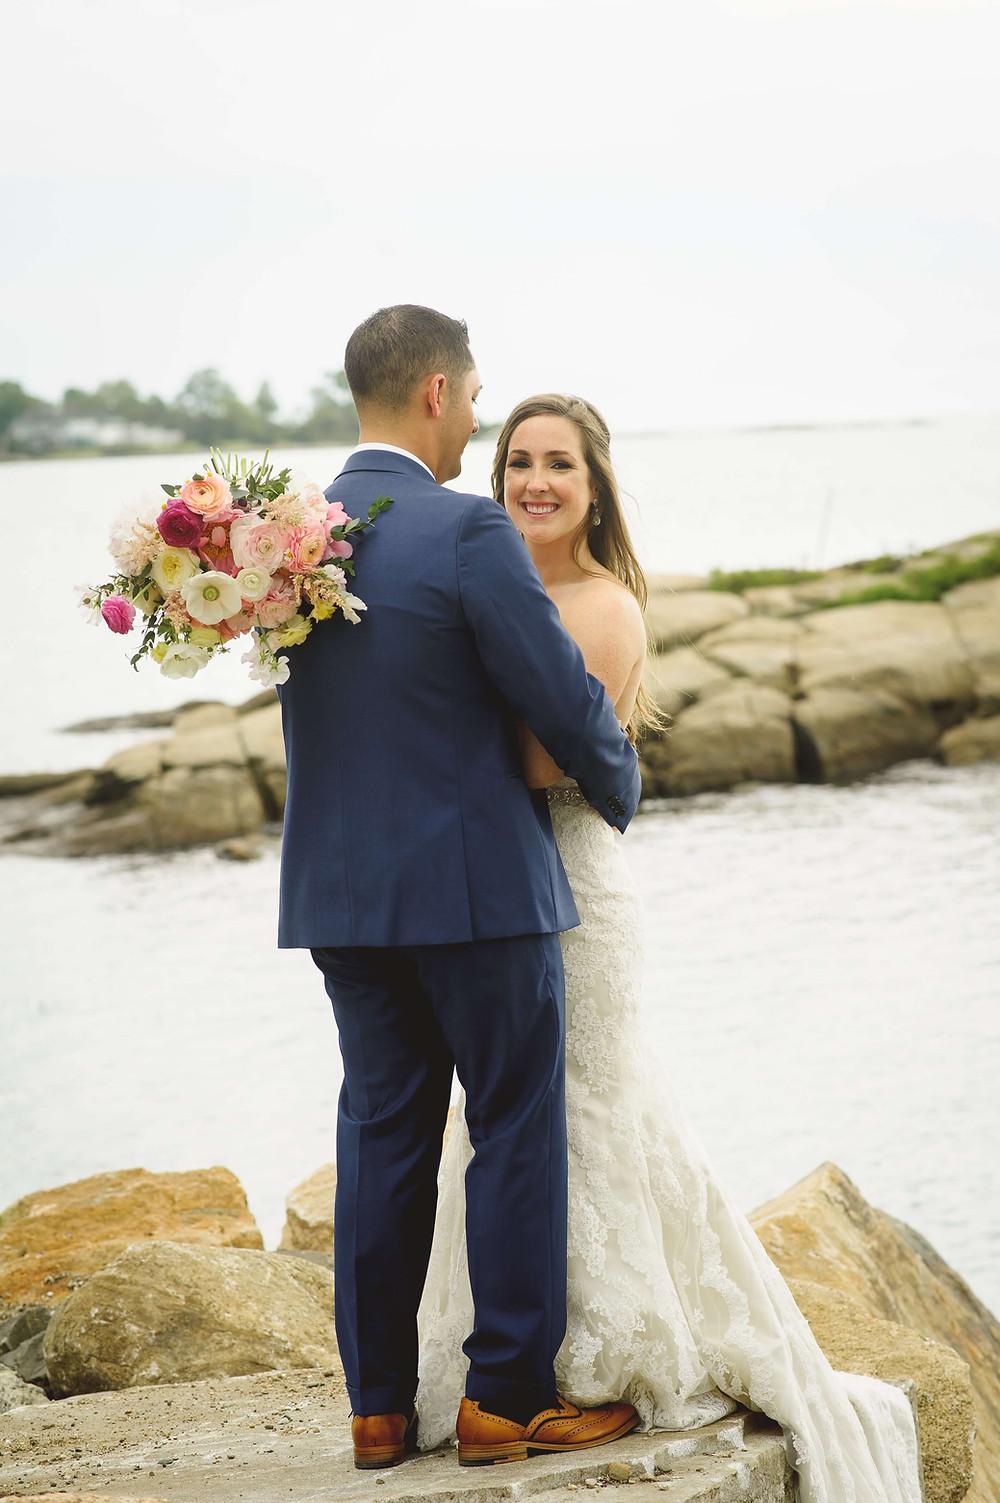 Coral peony + Teal wedding